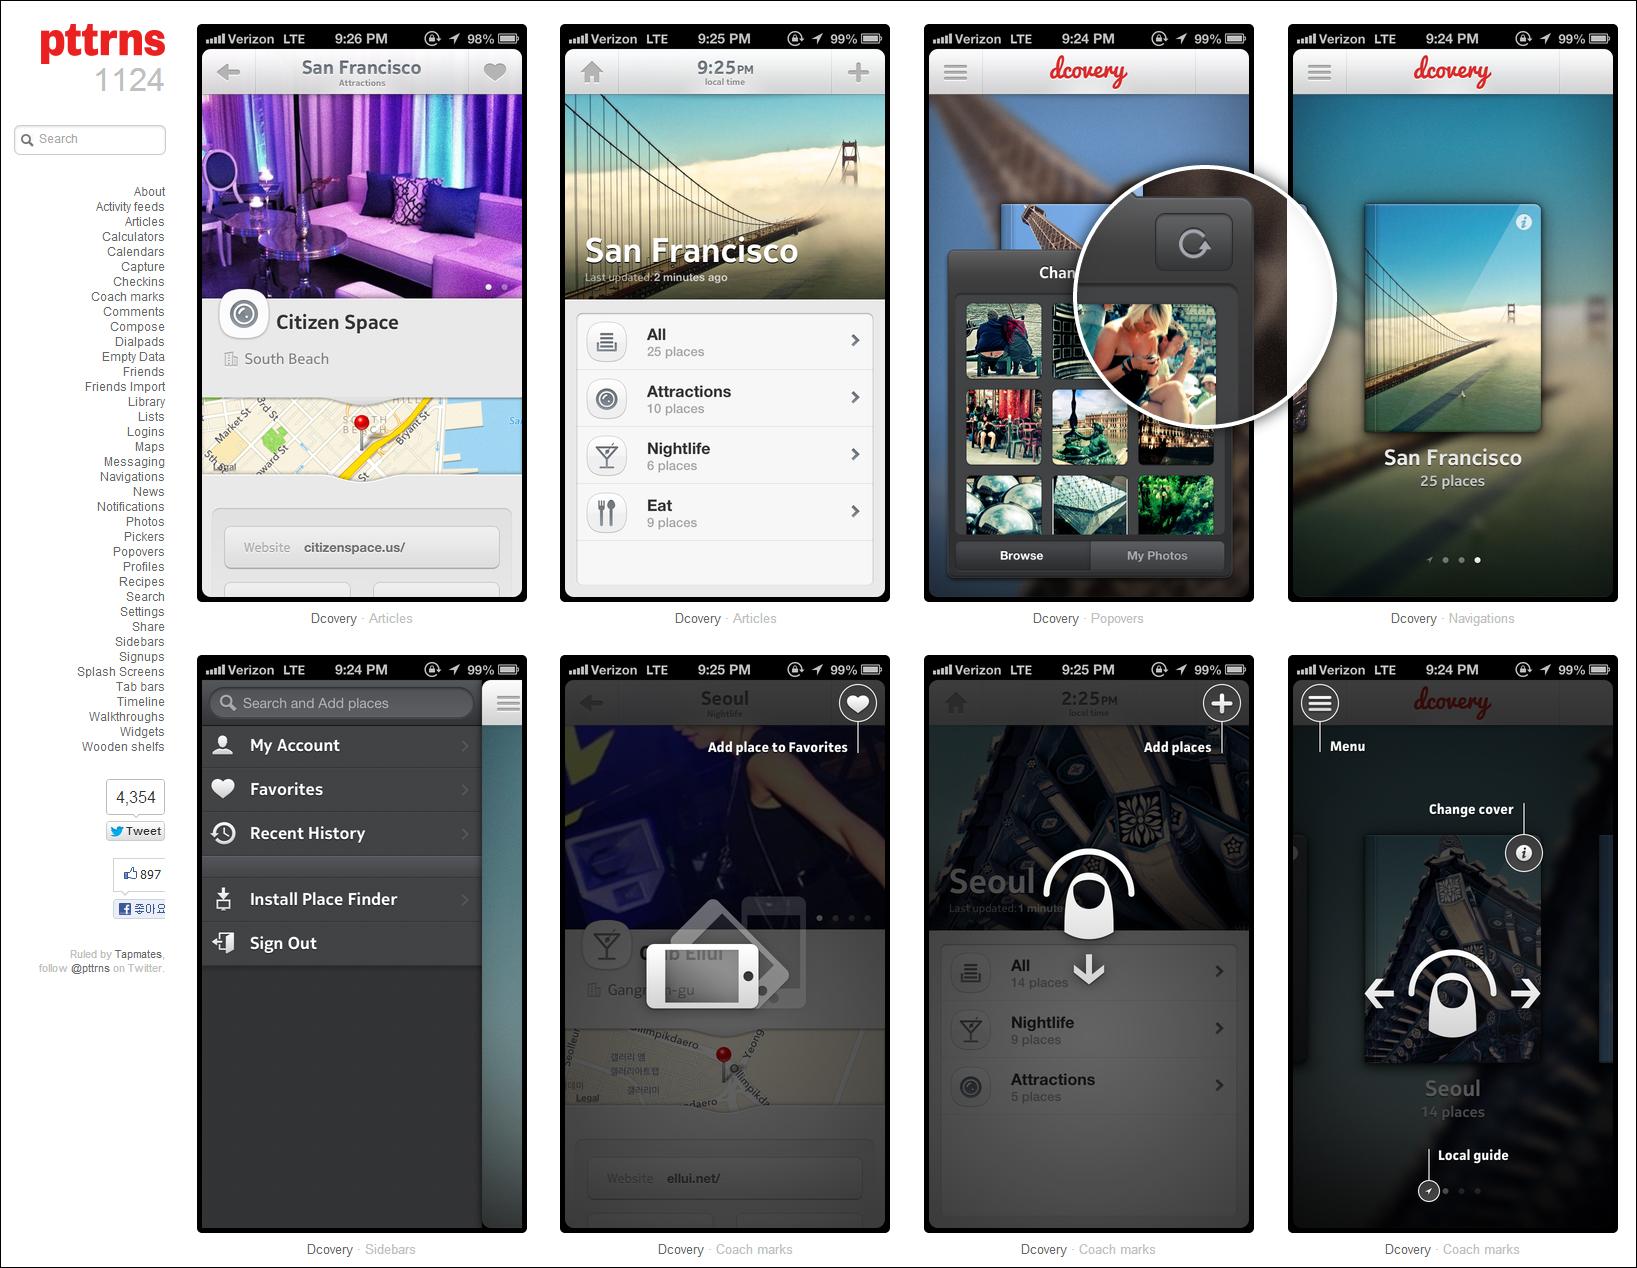 (Updated) 모바일 UI 디자인 패턴 참고 사이트 20개 총정리